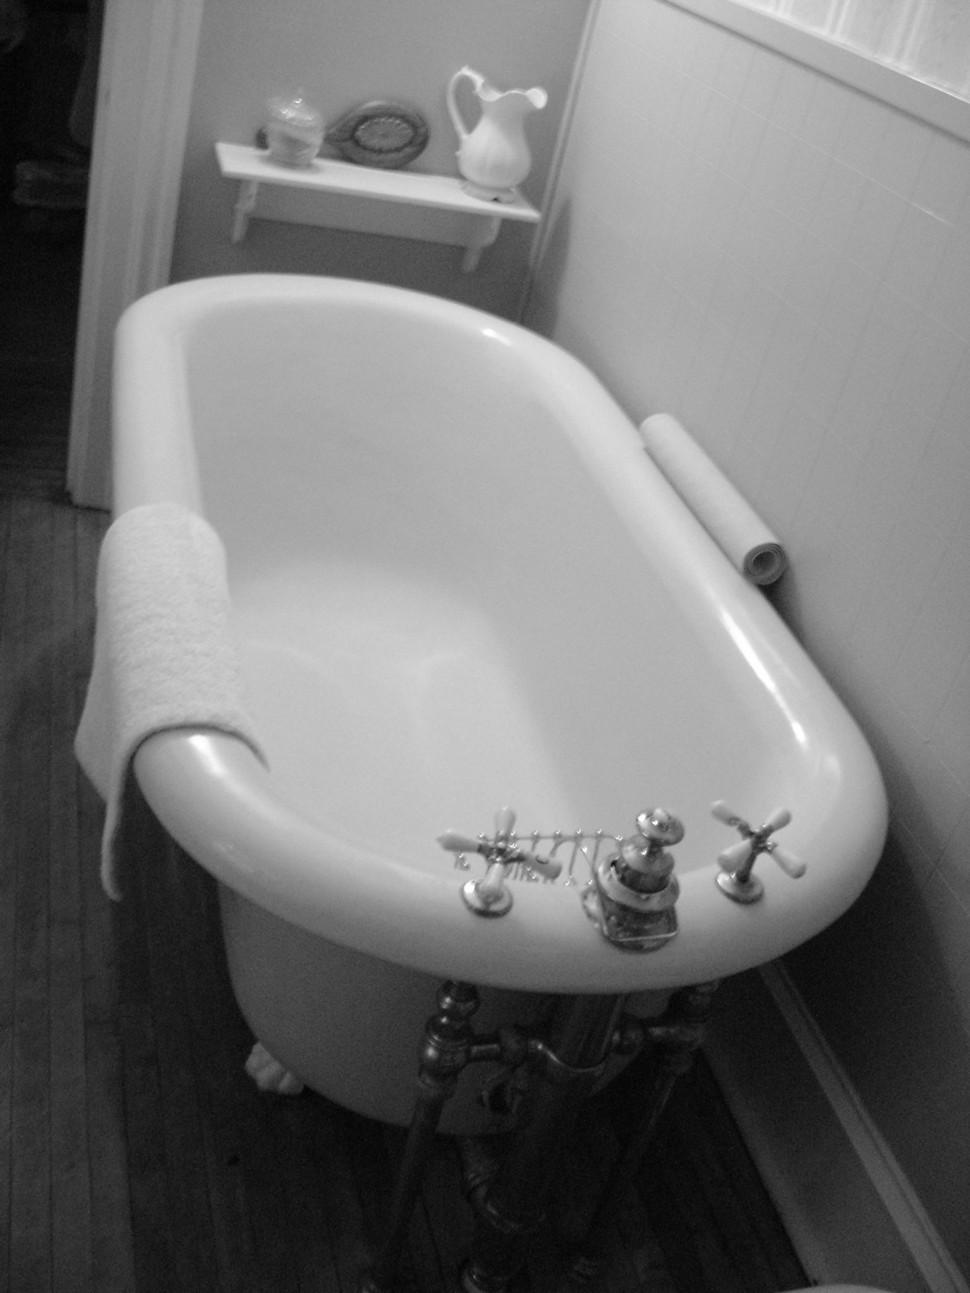 Nineteenth_century_bathtub_grayscale.jpg